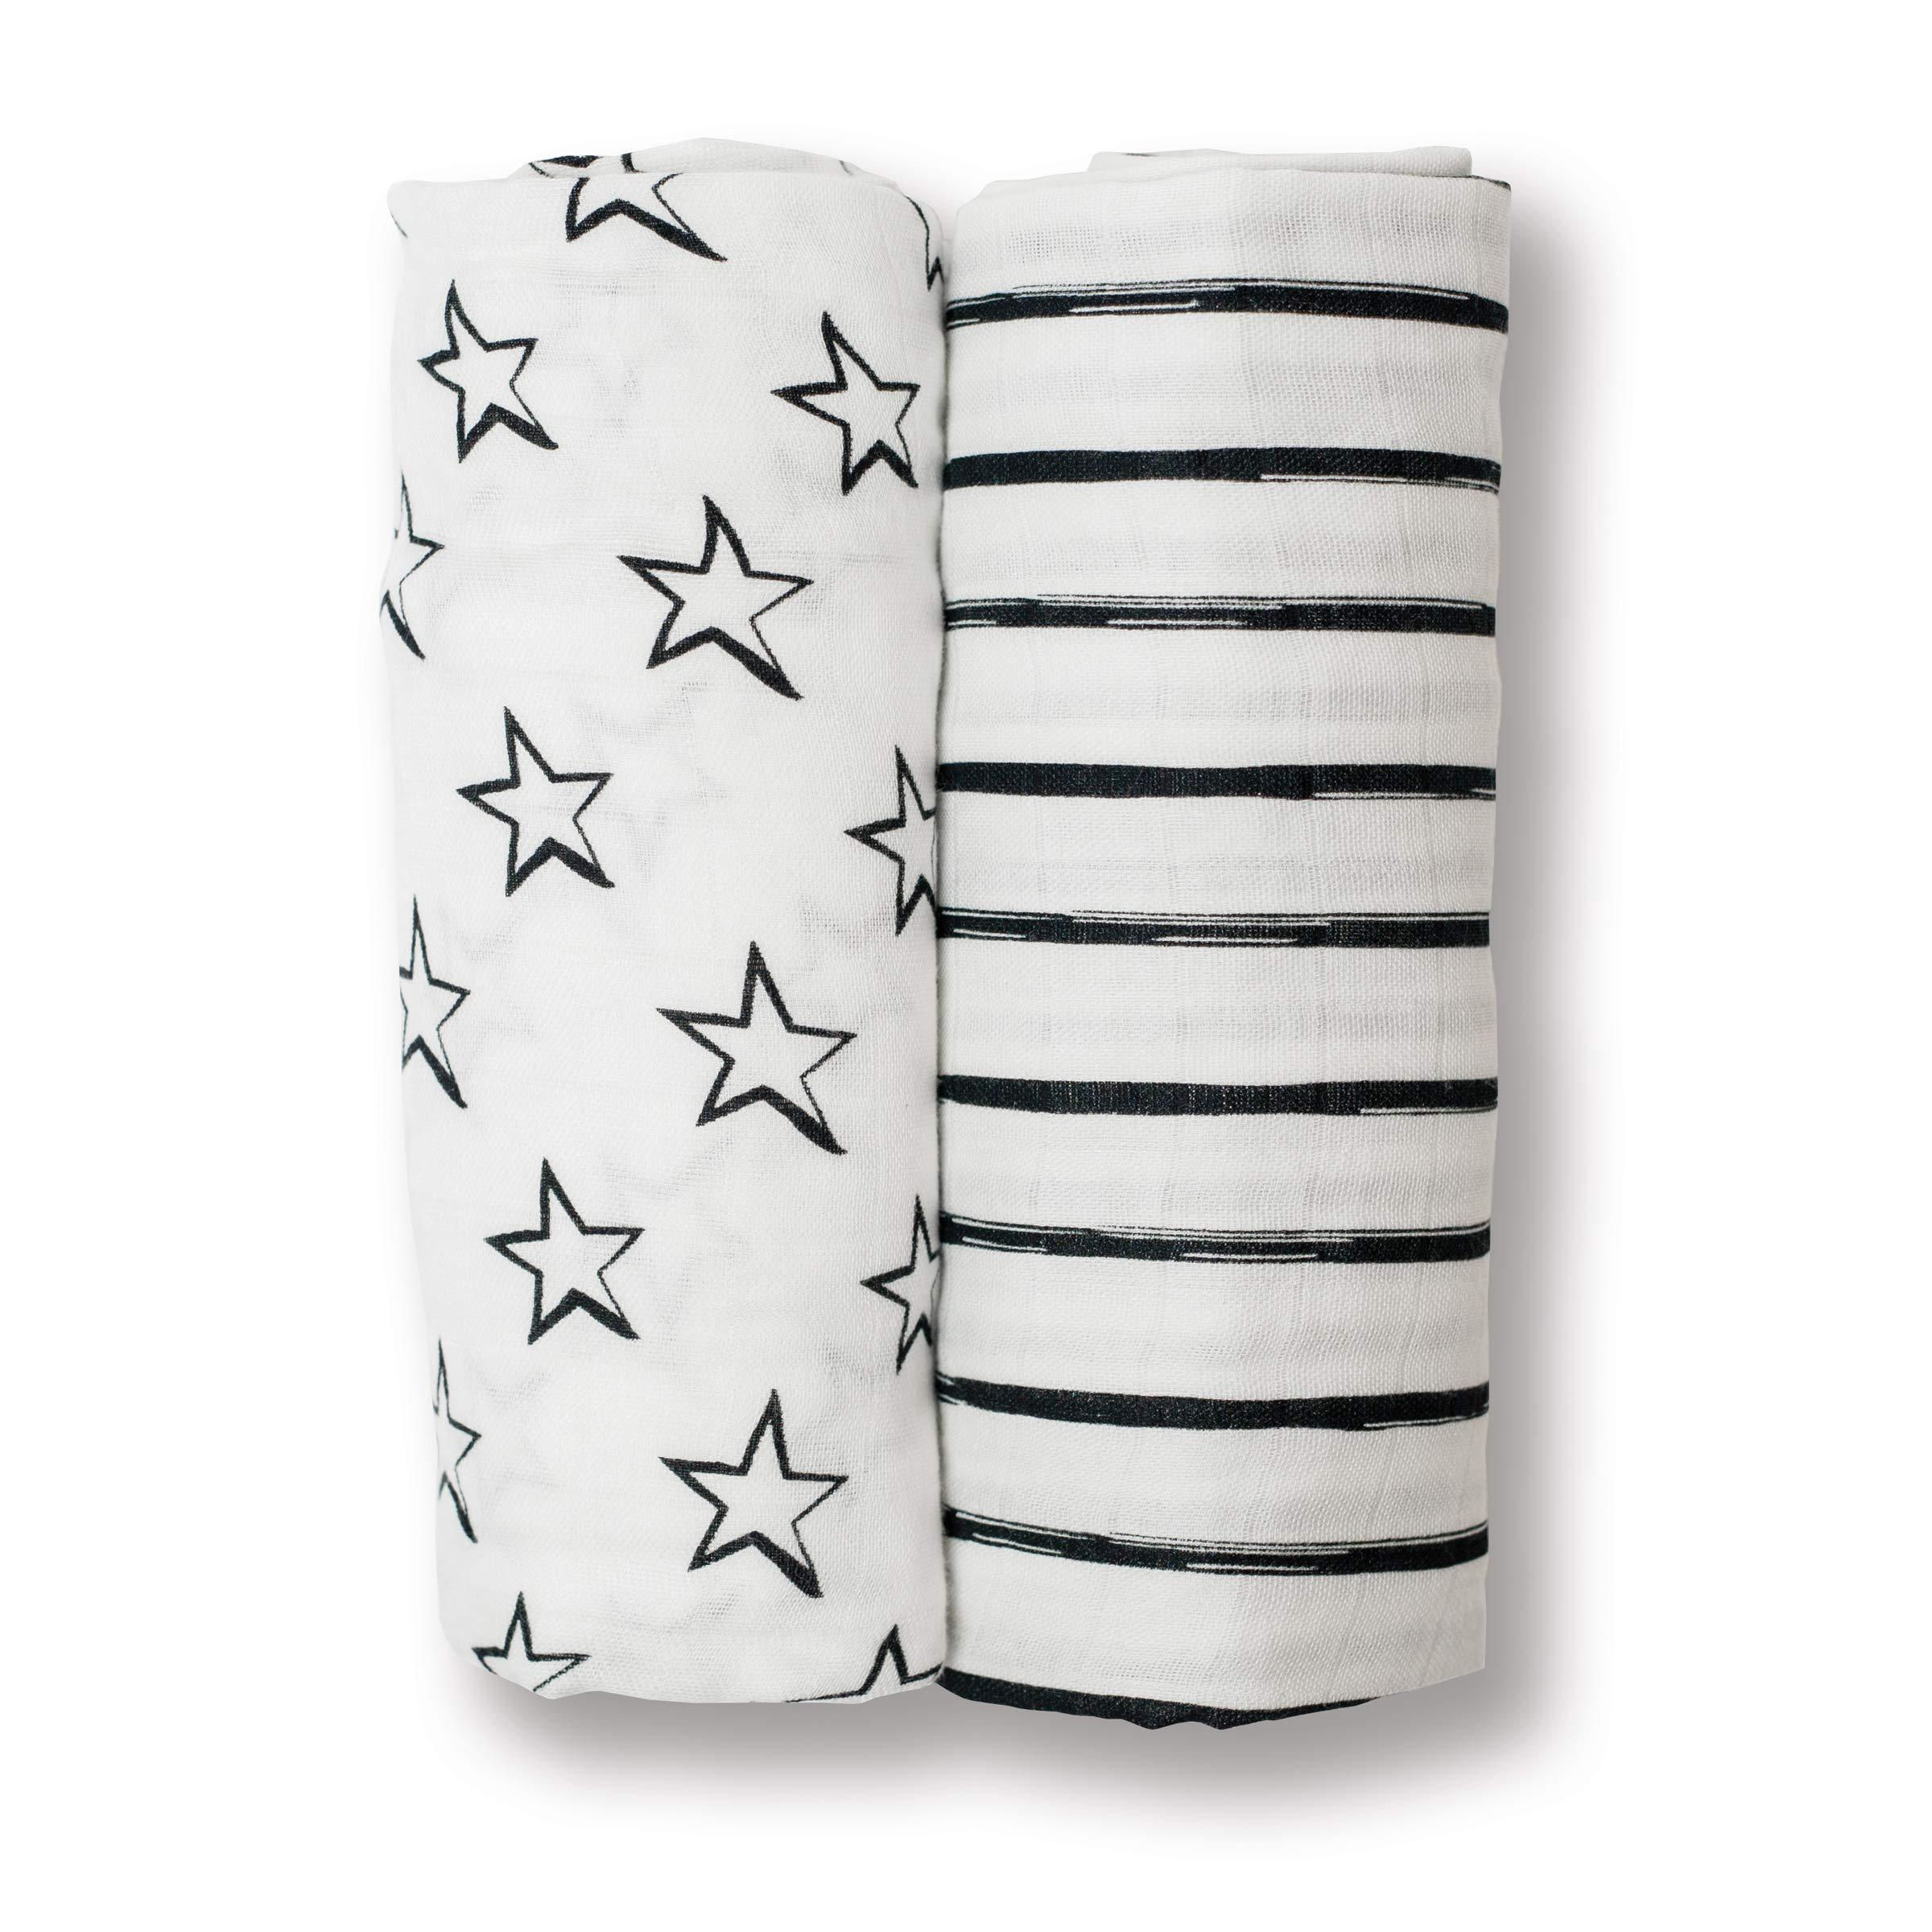 lulujo Baby 2 Piece Cotton Muslin Swaddling Blankets, Black/White Stars & Stripes